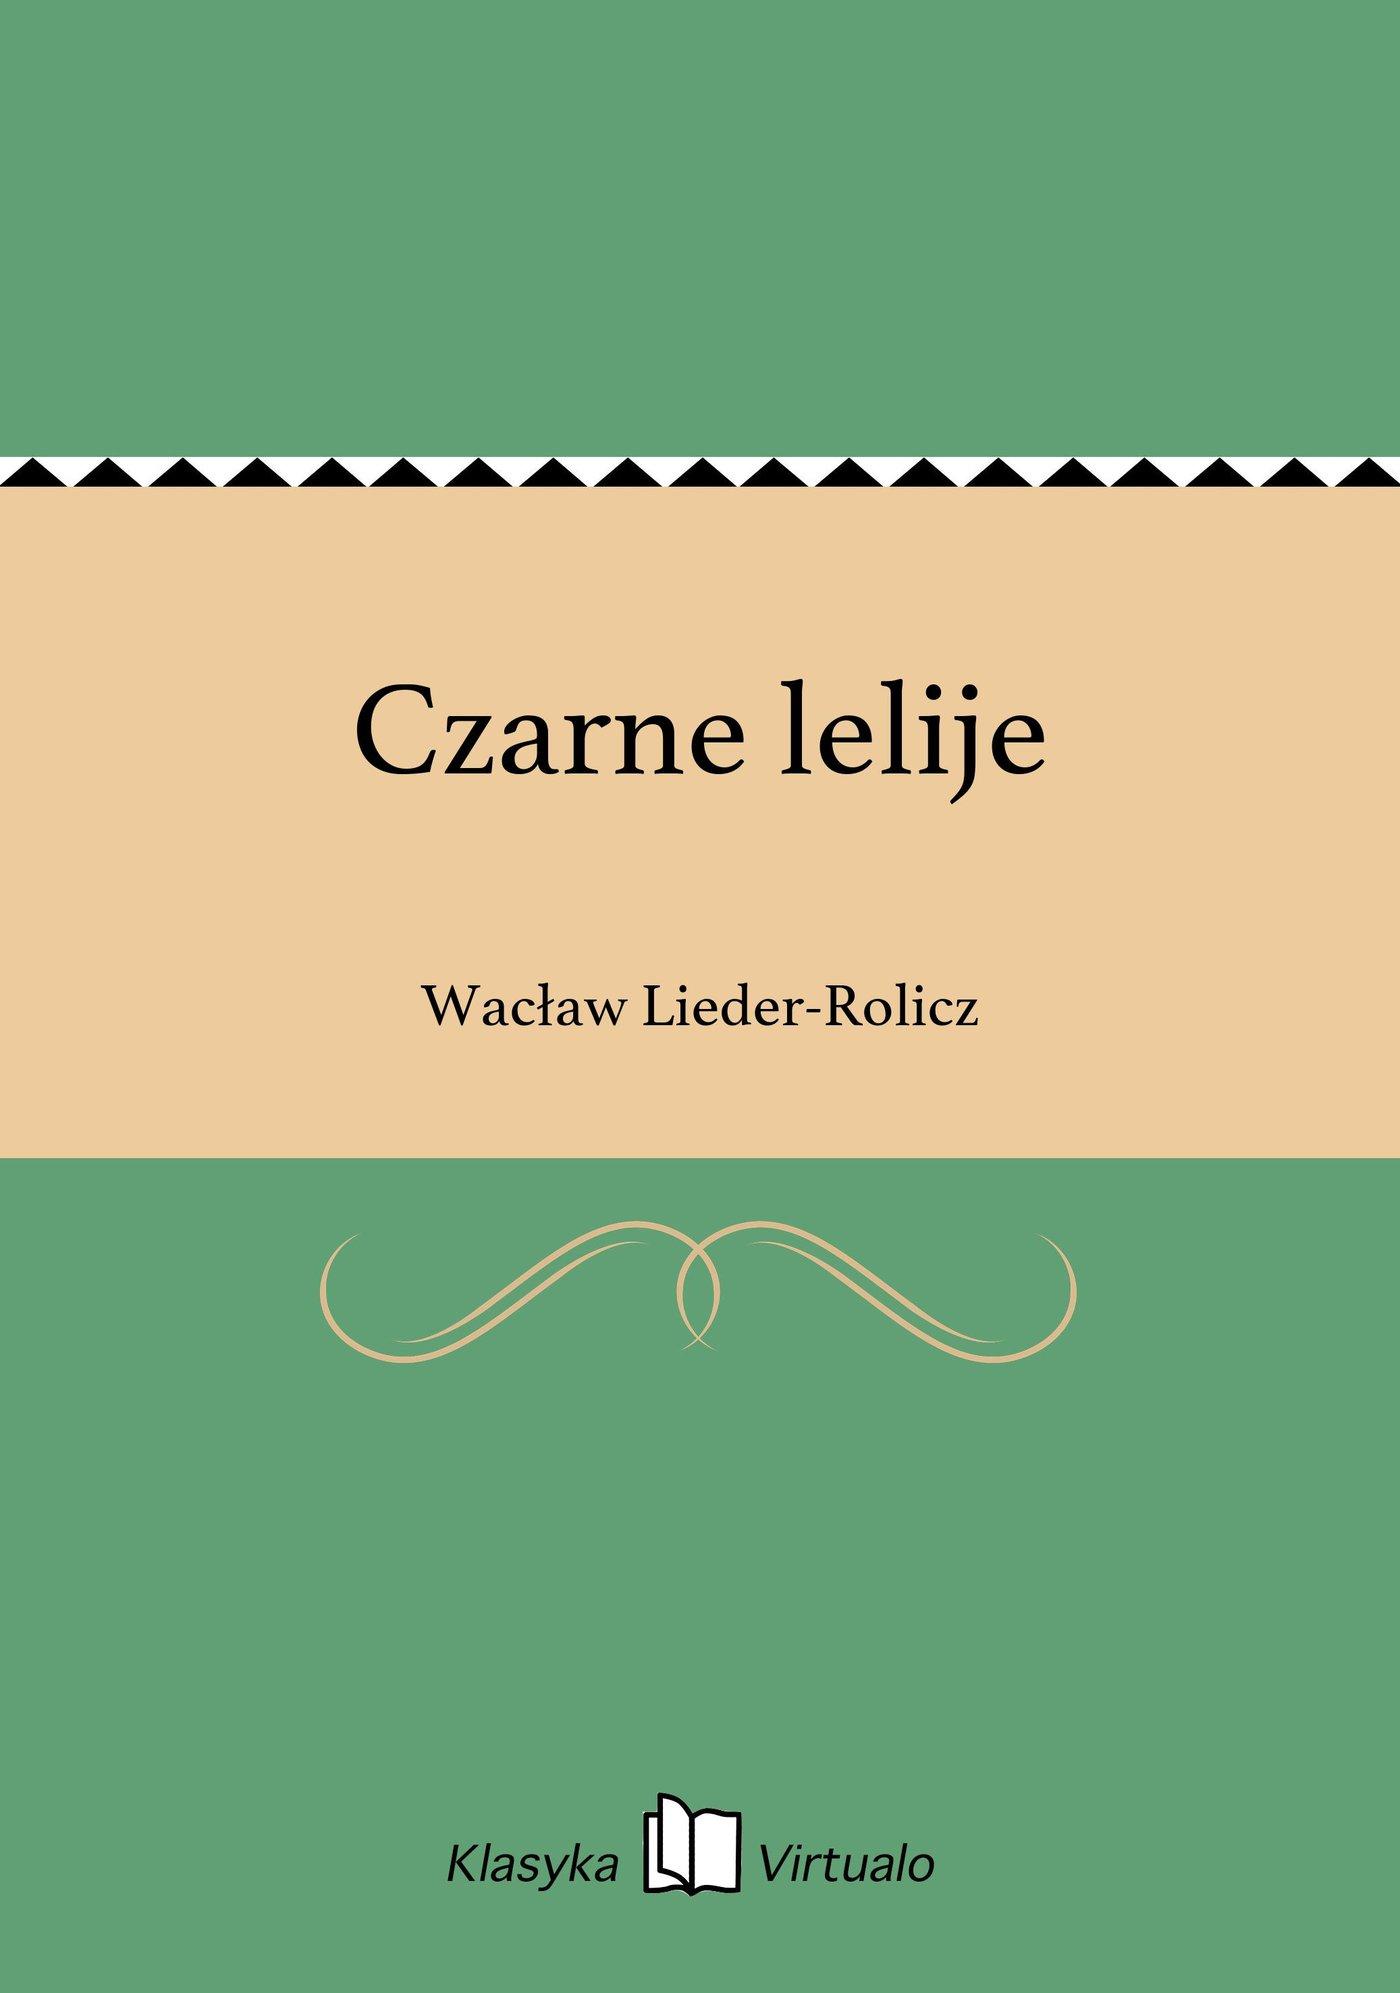 Czarne lelije - Ebook (Książka na Kindle) do pobrania w formacie MOBI